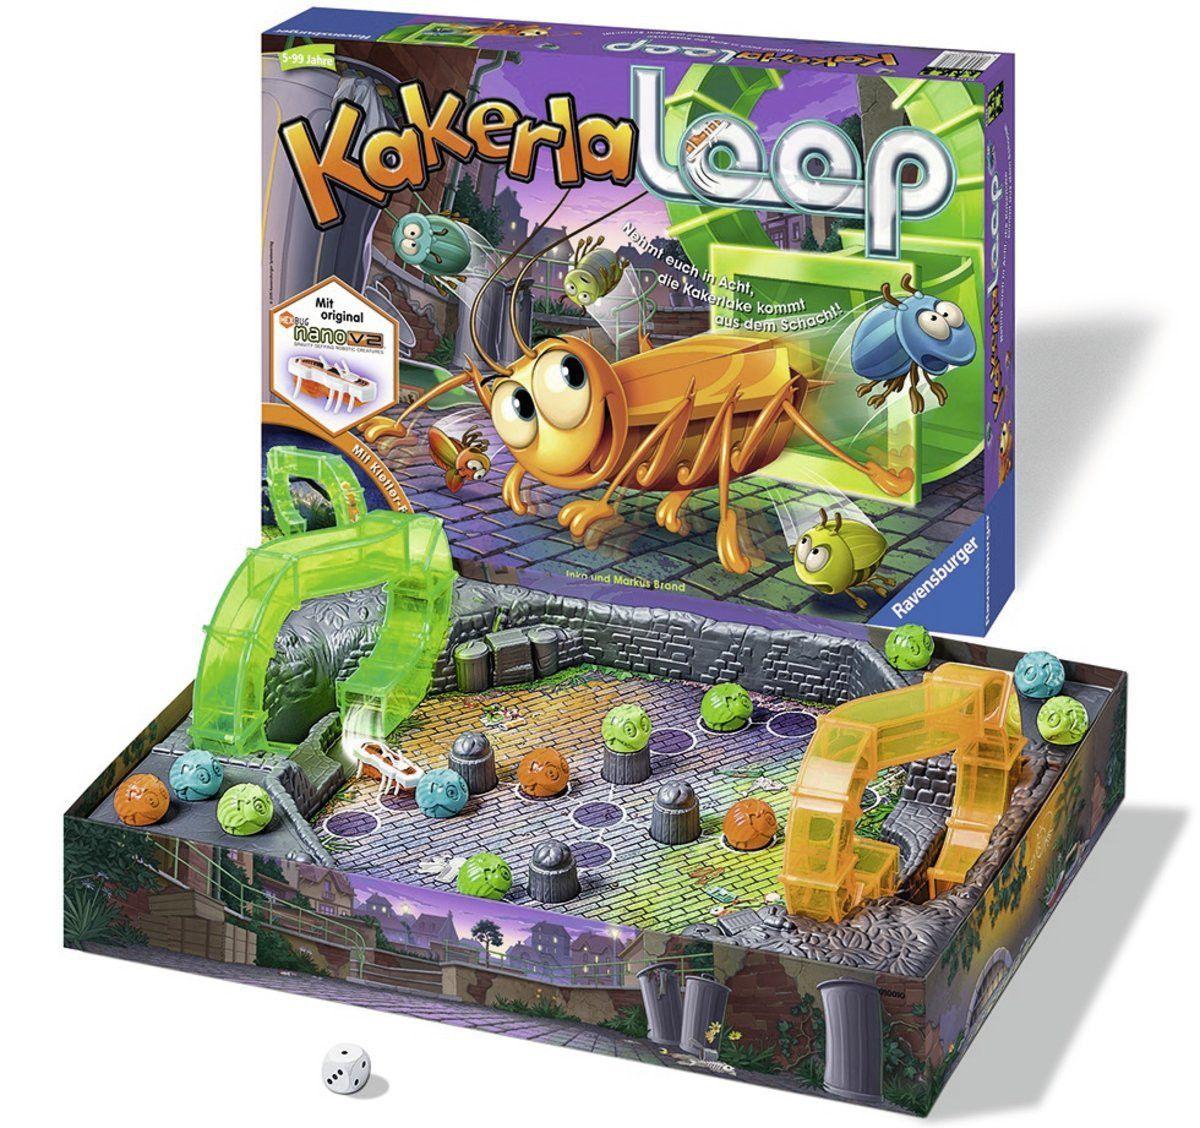 Kakerlaloop Spiele für kinder, Spiele, Kakerlaken